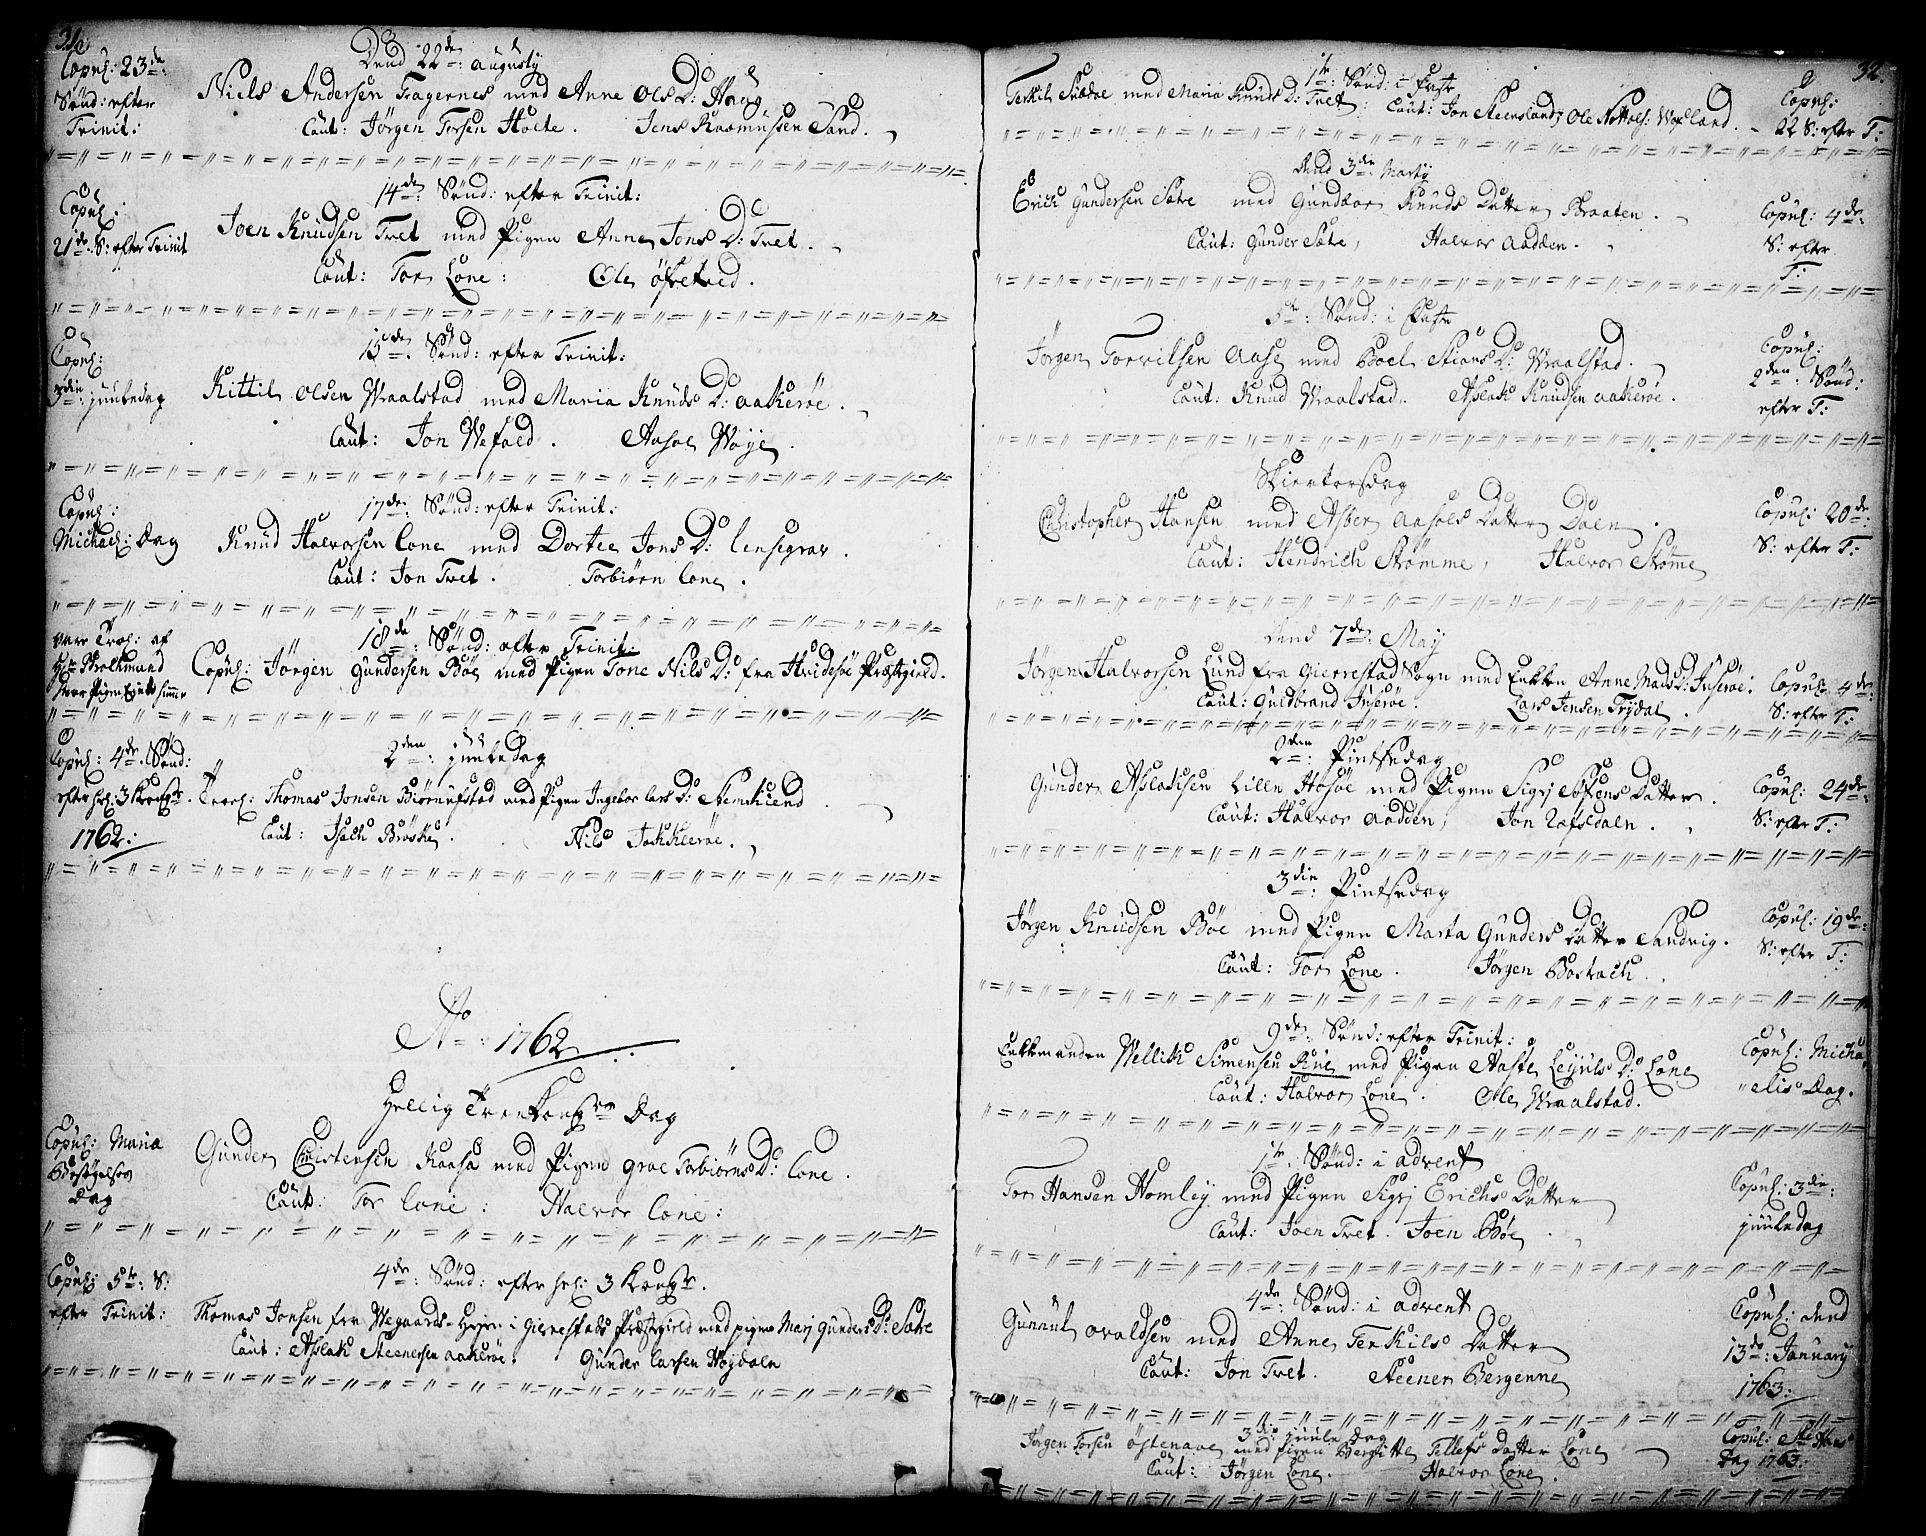 SAKO, Drangedal kirkebøker, F/Fa/L0001: Ministerialbok nr. 1, 1697-1767, s. 31-32